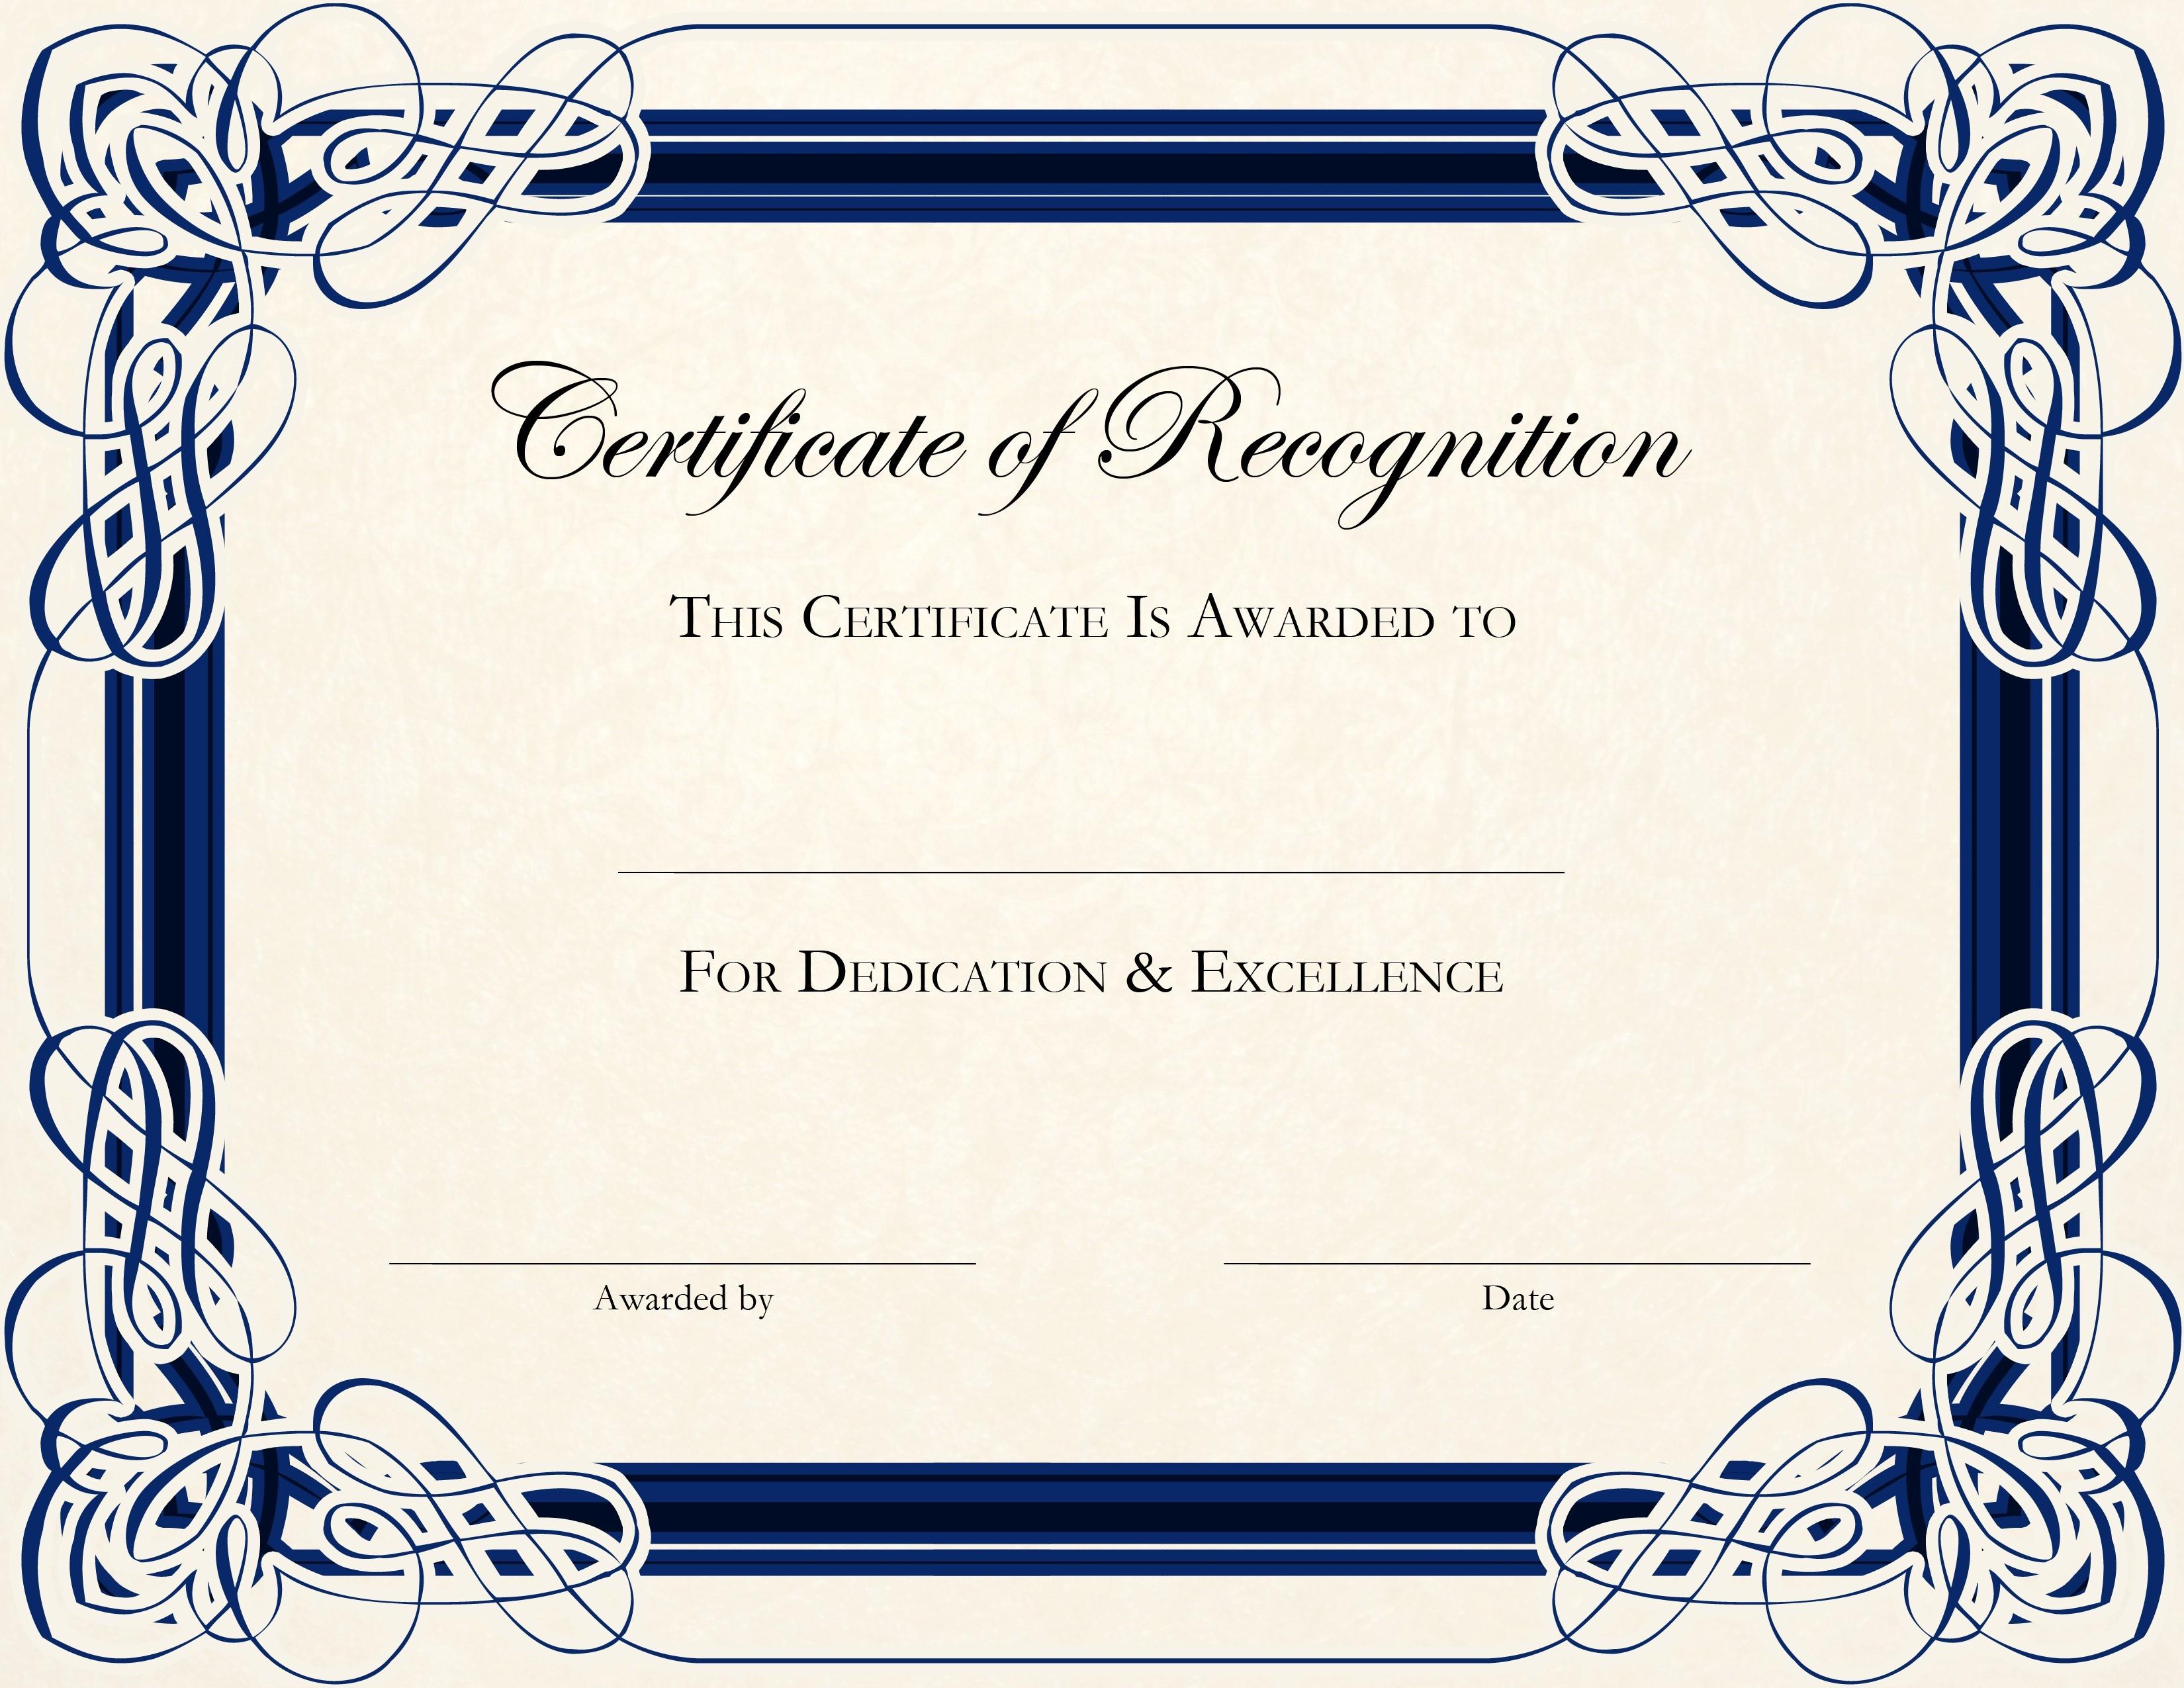 Best of border crisia. Certificate clipart certification